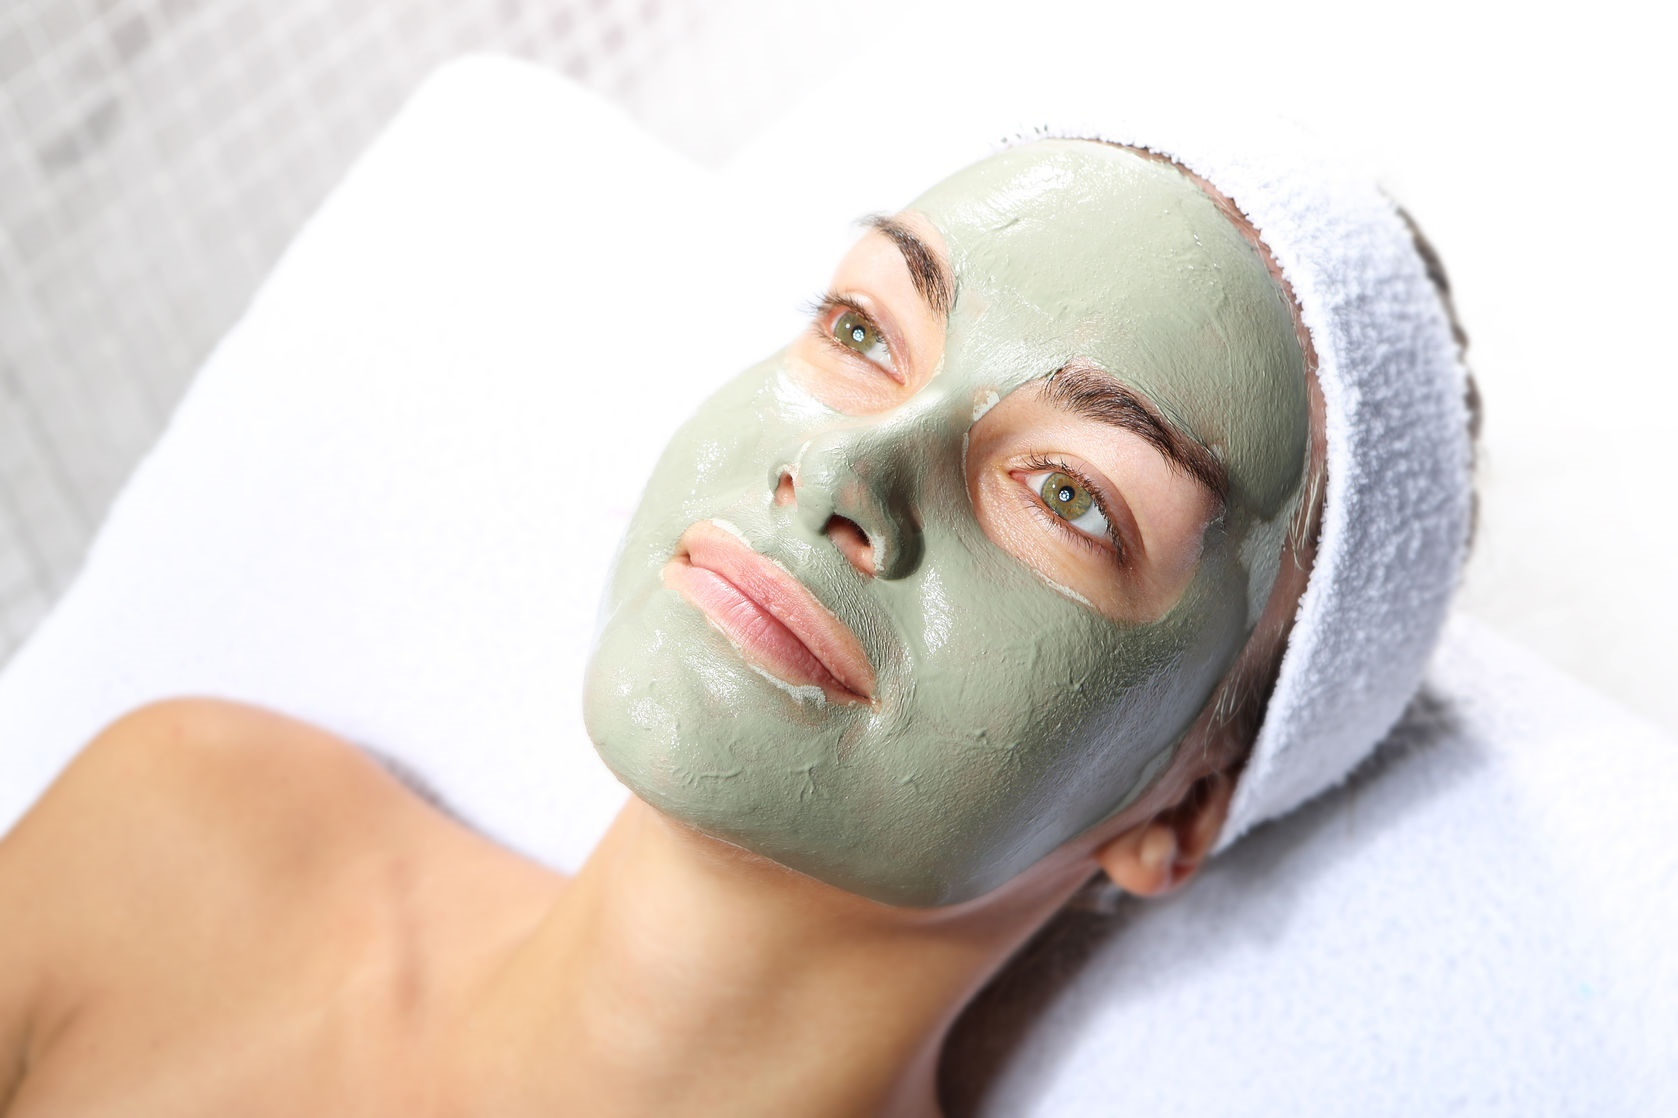 Nude facial mask ratings nicole